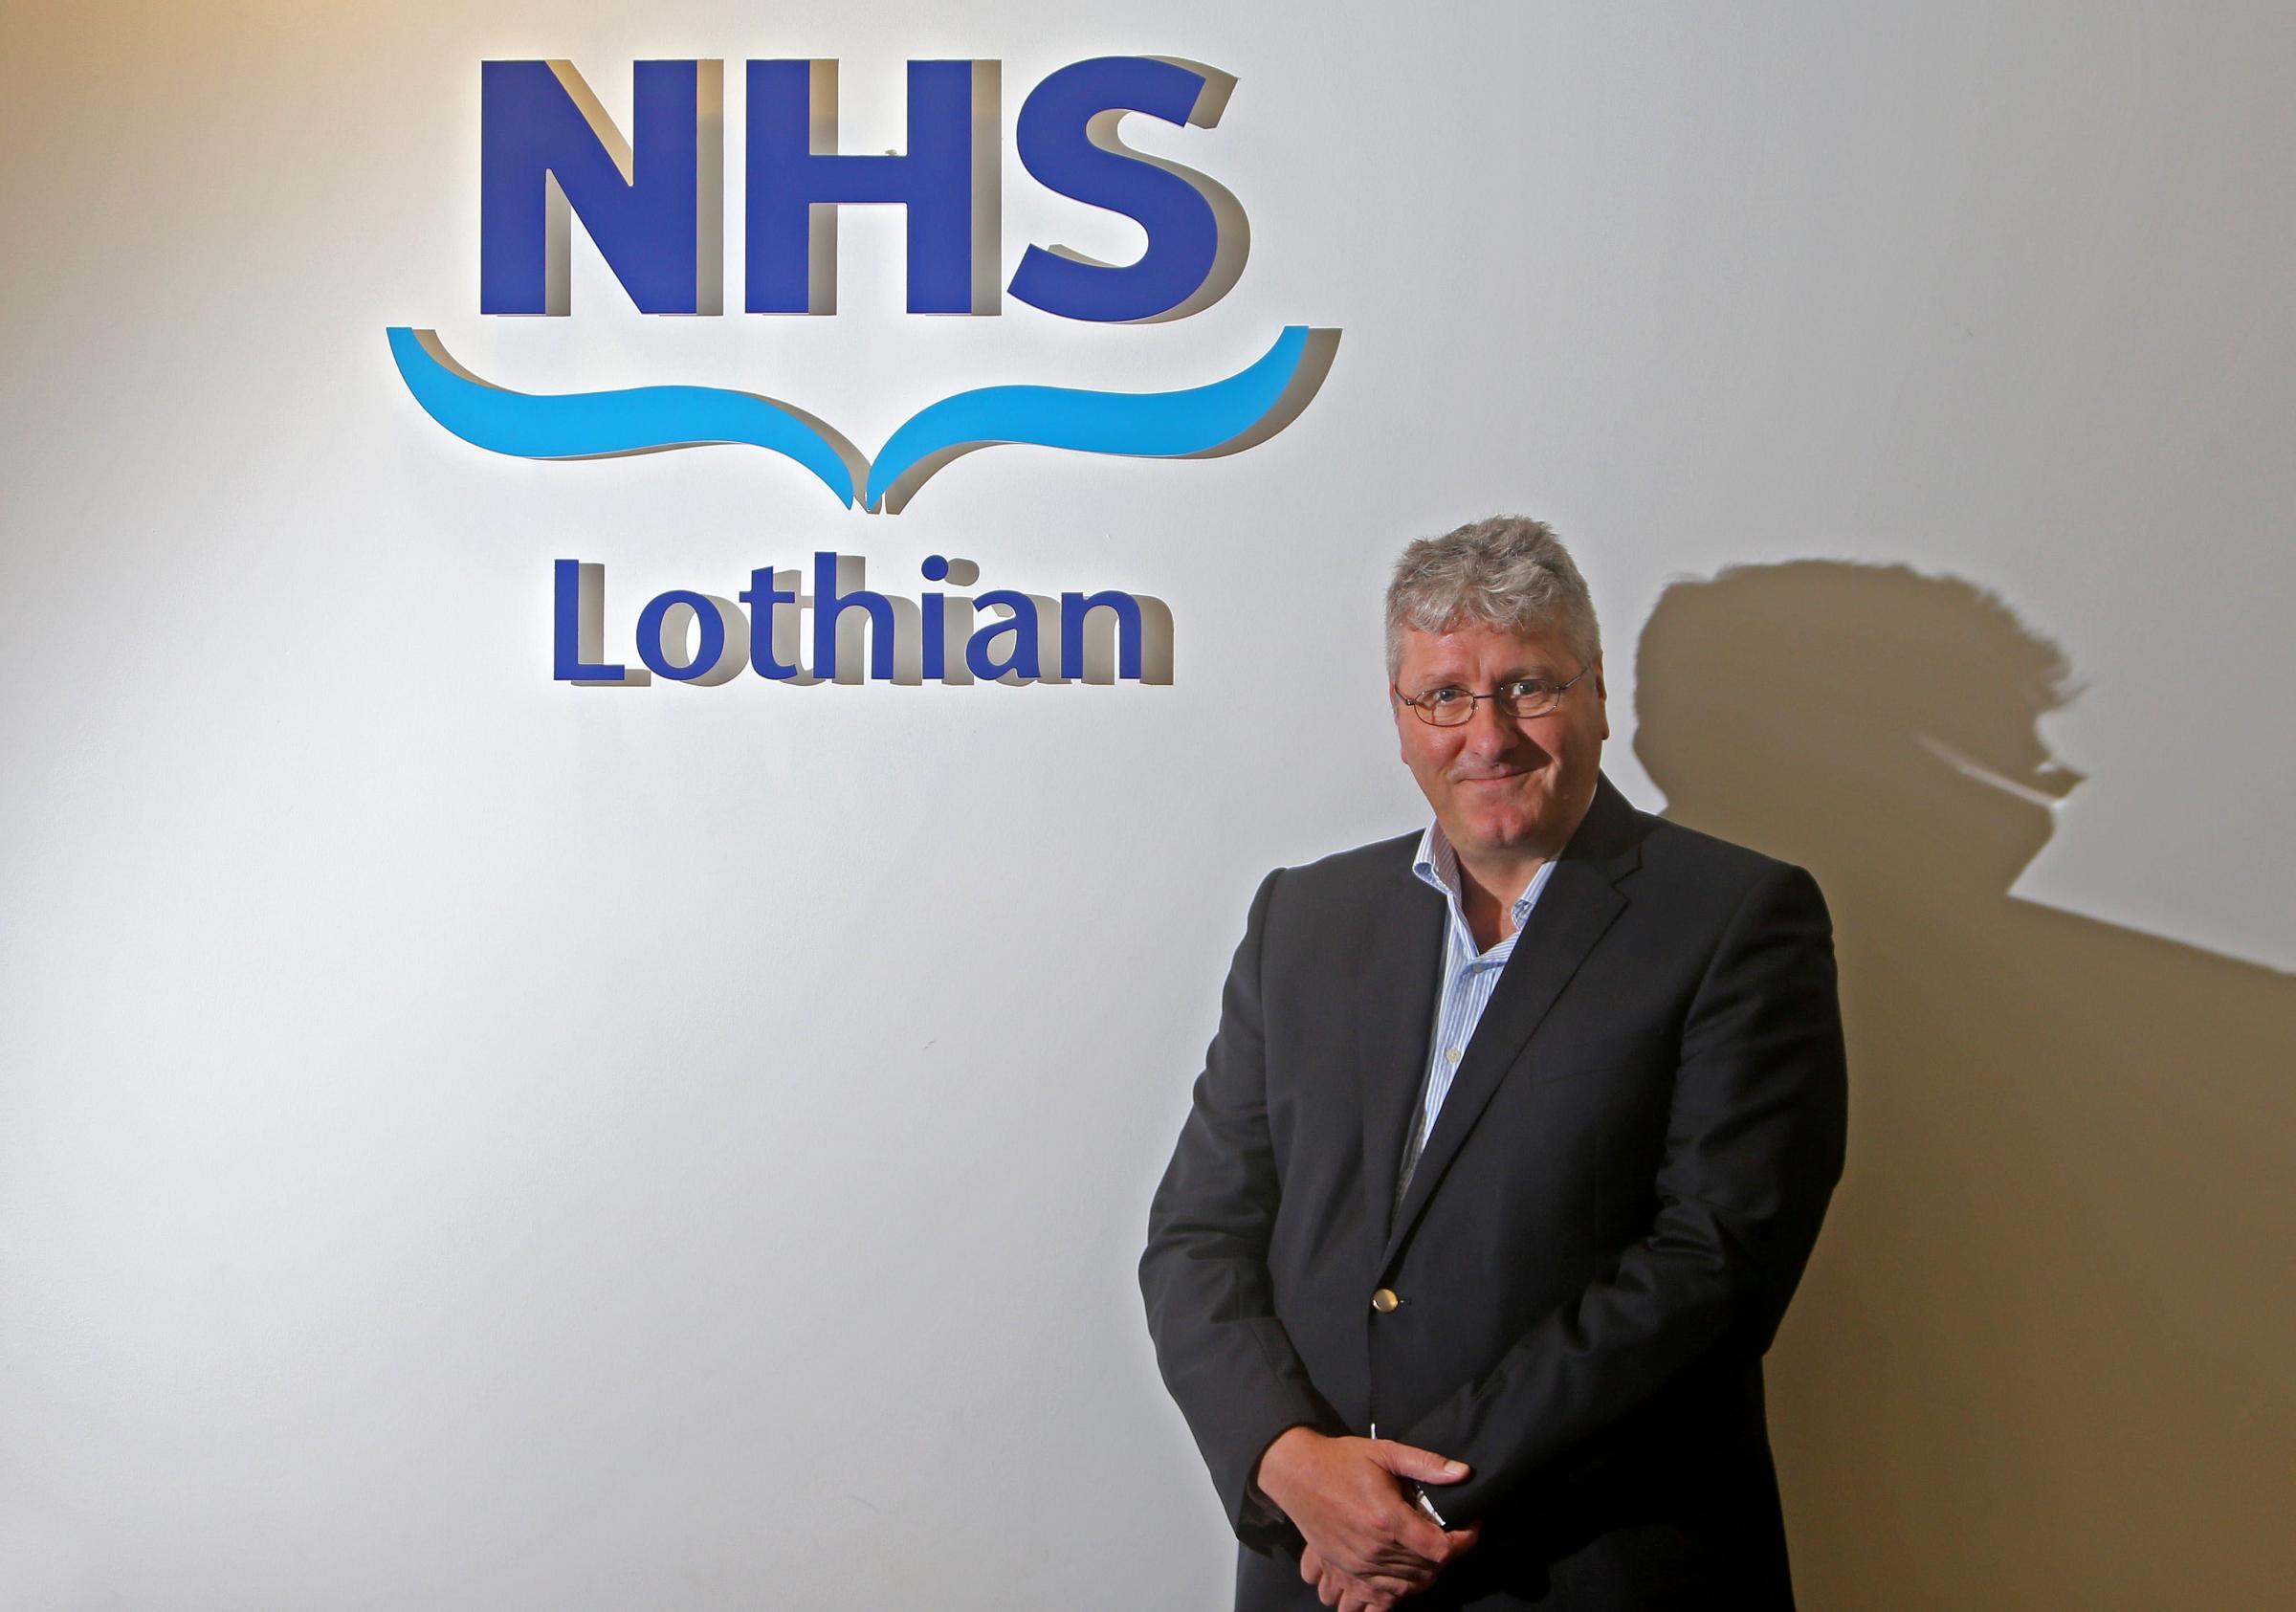 NHS Lothian board boss Tim Davison to quit his post